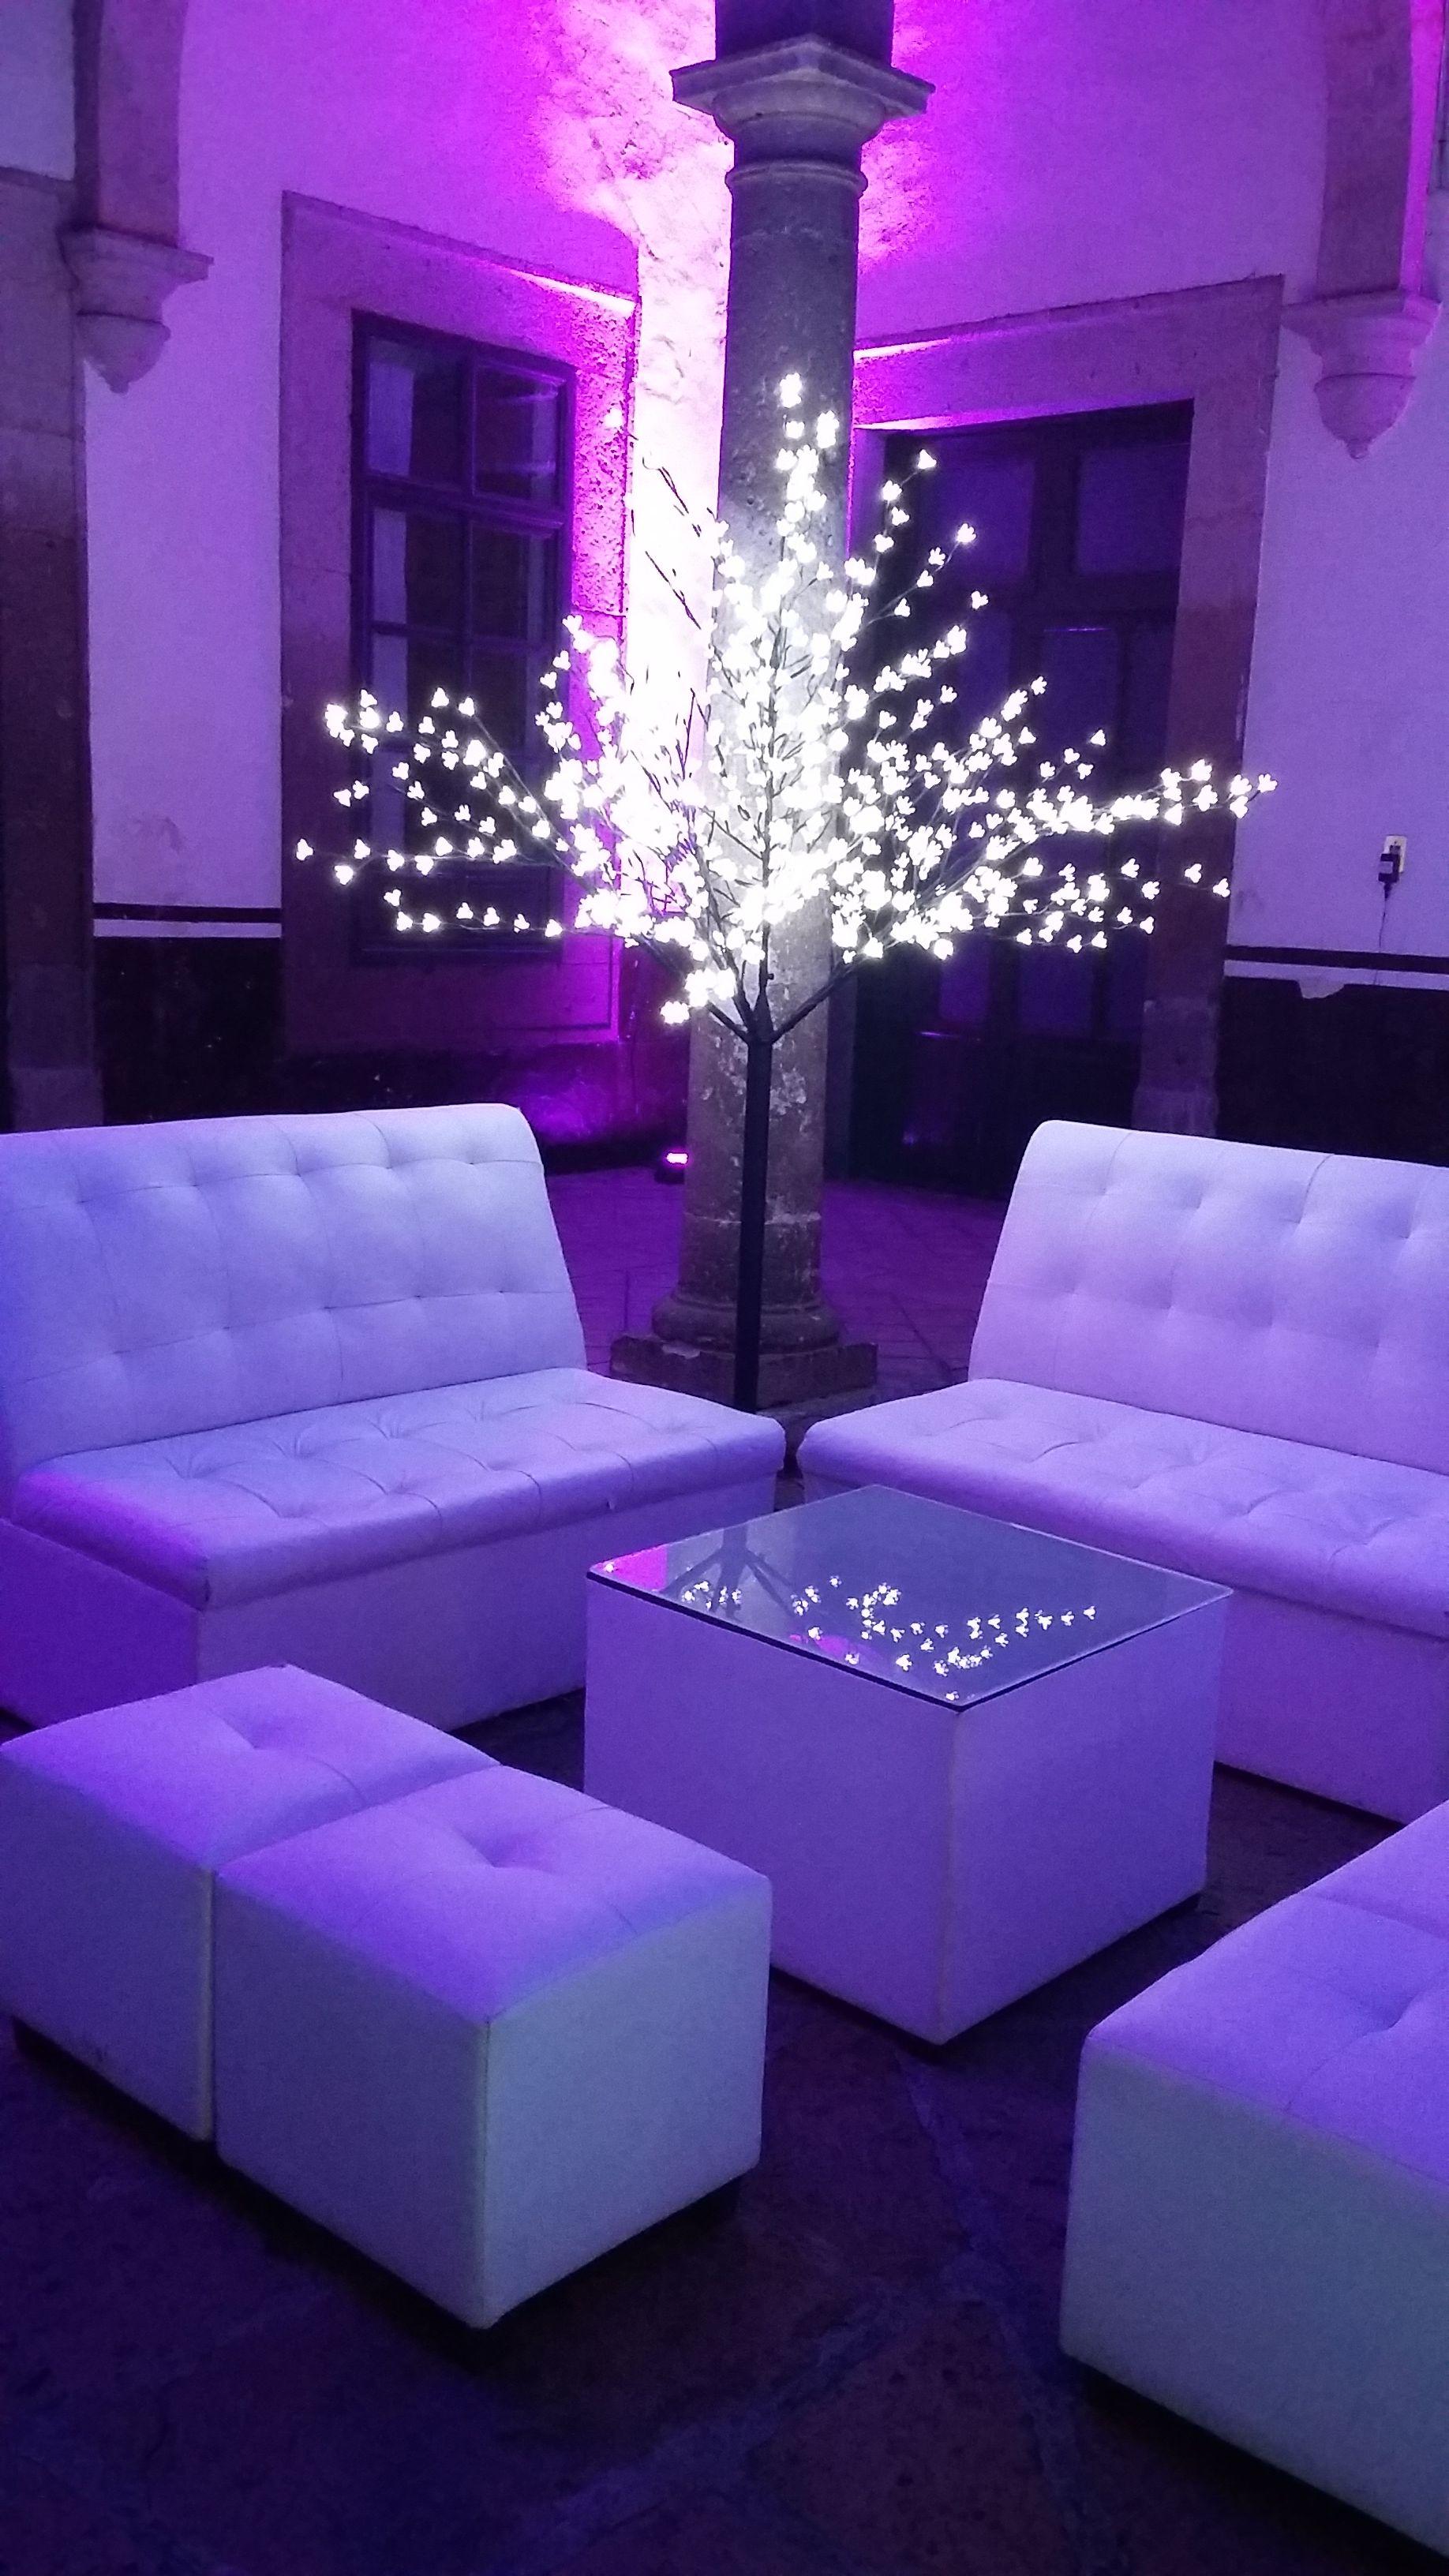 Renta De Salas Lounge Xpoo Music Morelia Mich Salas Lounge Blancas Arbolitos Iluminados De Leds Xpoo Music Morelia Mich Mexico 44 31 Home Home Decor Decor